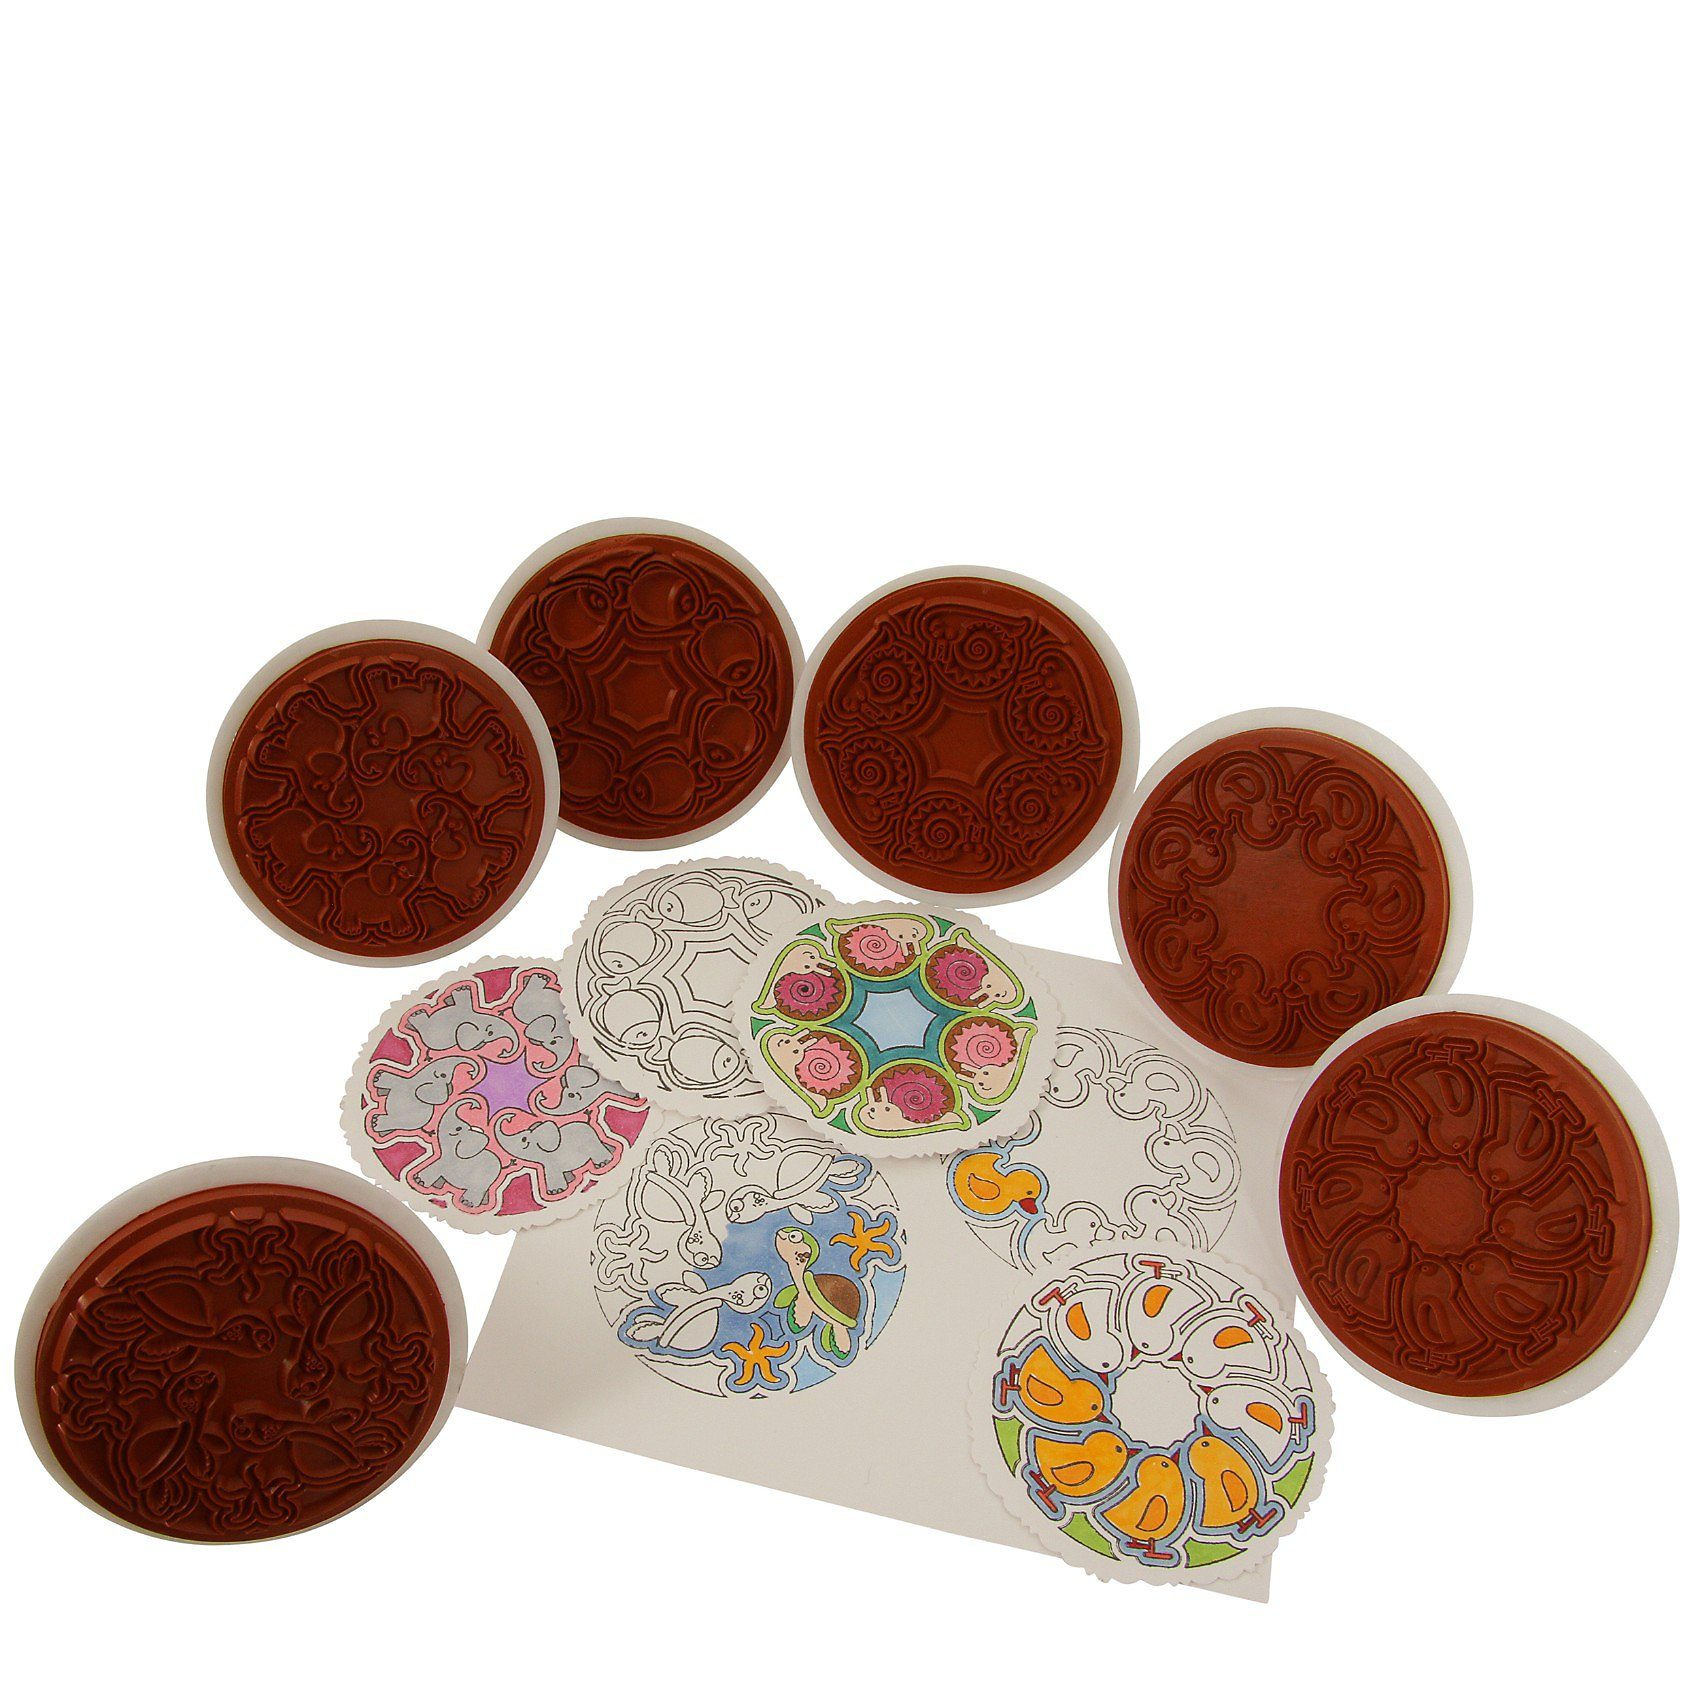 SUNNYSUE Riesenstempel Mandala, 6 Stück